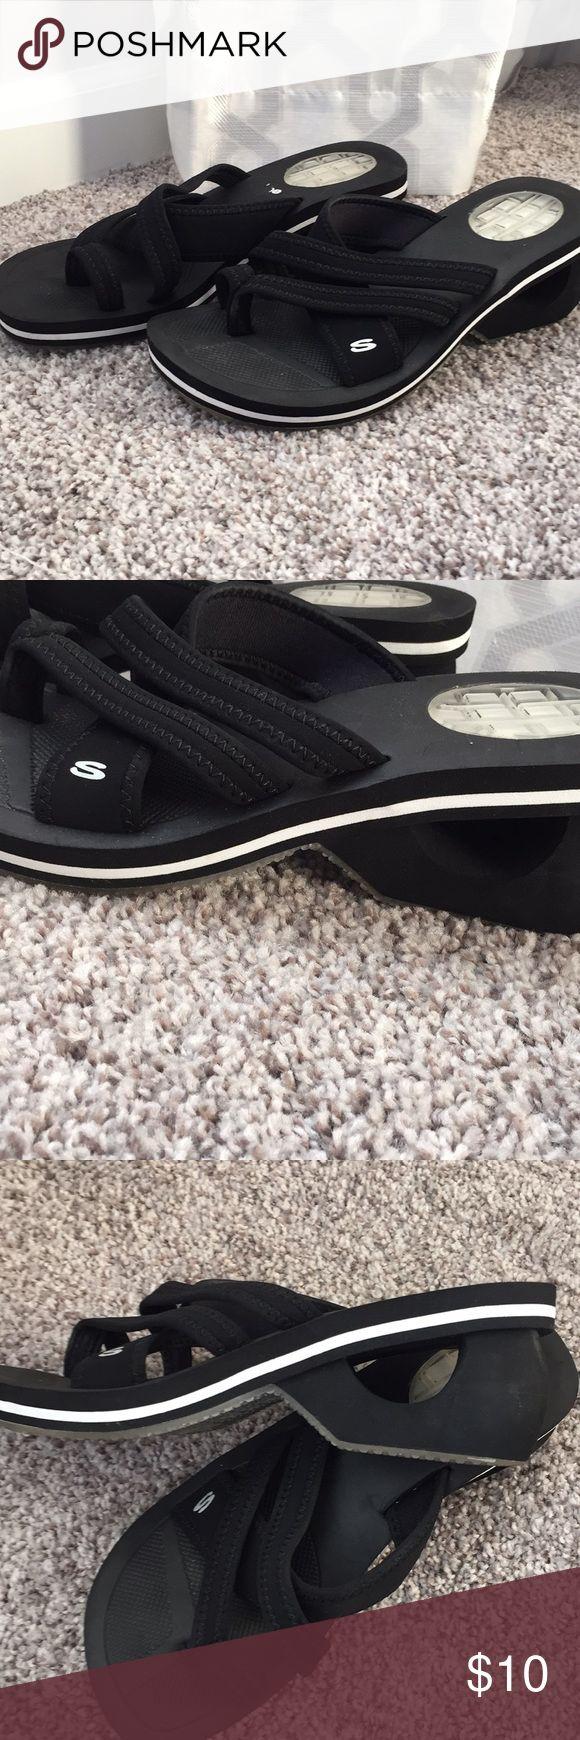 Skechers Black Wedge Sandals Size 7 Skechers Wedge Sandals.  Great condition!  Size 7 Skechers Shoes Sandals